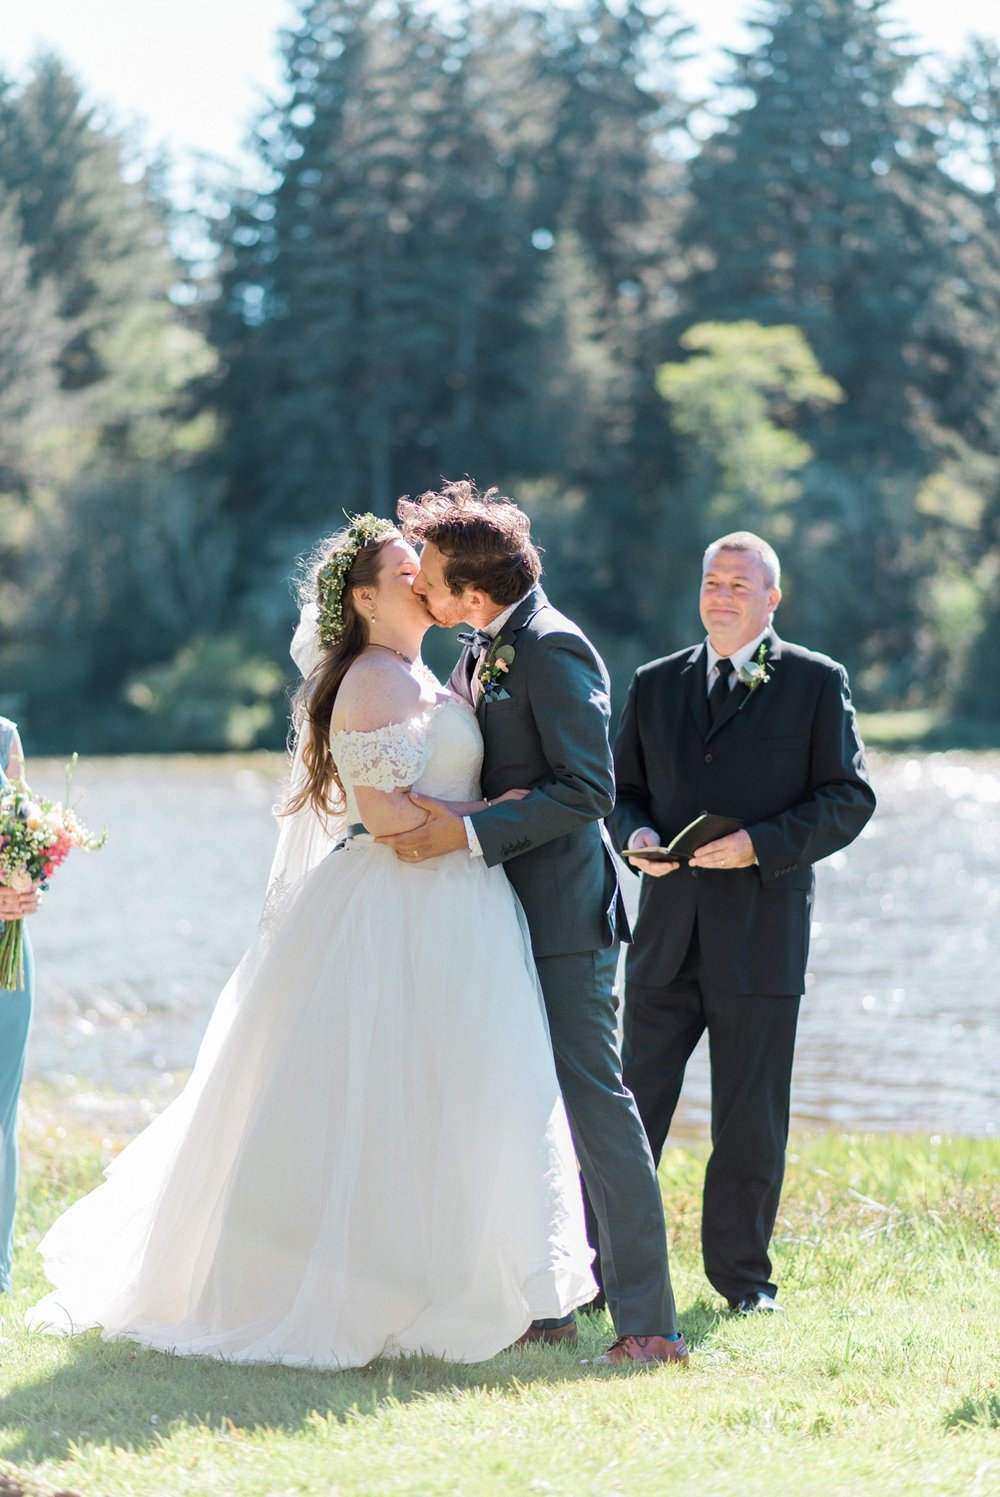 astoria-wedding-fort-stevens-oregon-kc-shelley-marie-photo-0760_cr.jpg